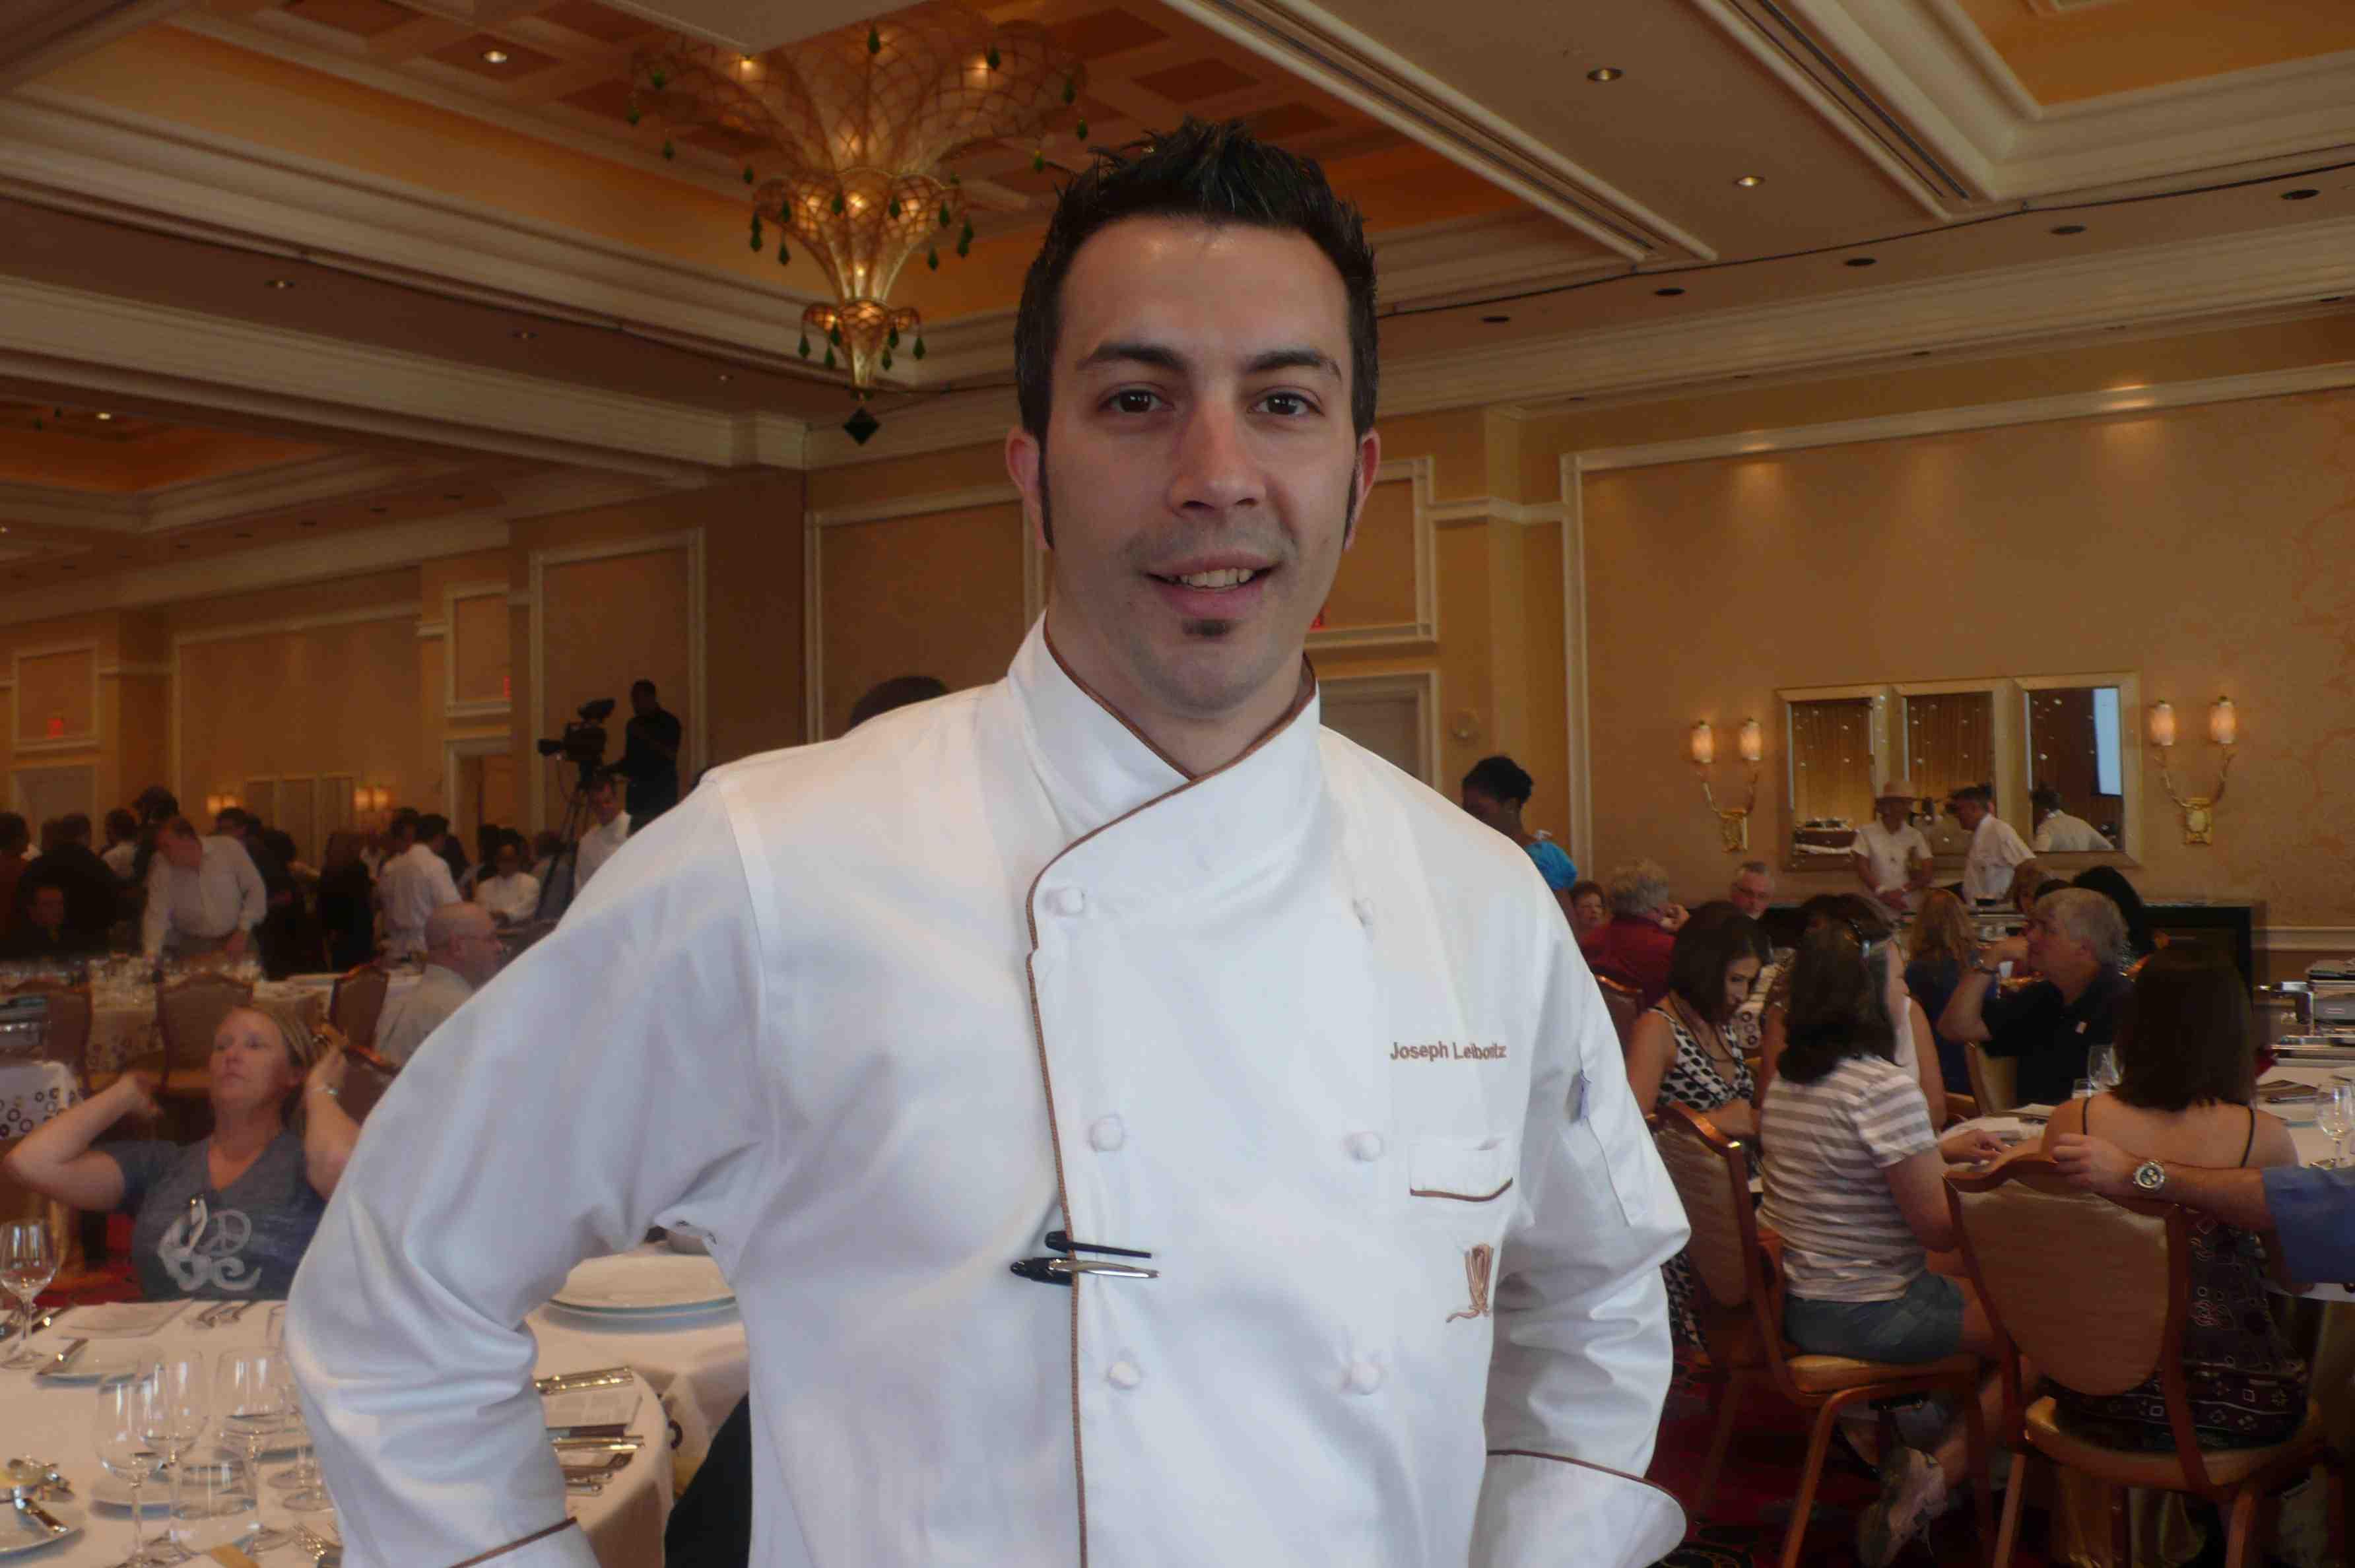 Alex chef Joseph Leibowitz